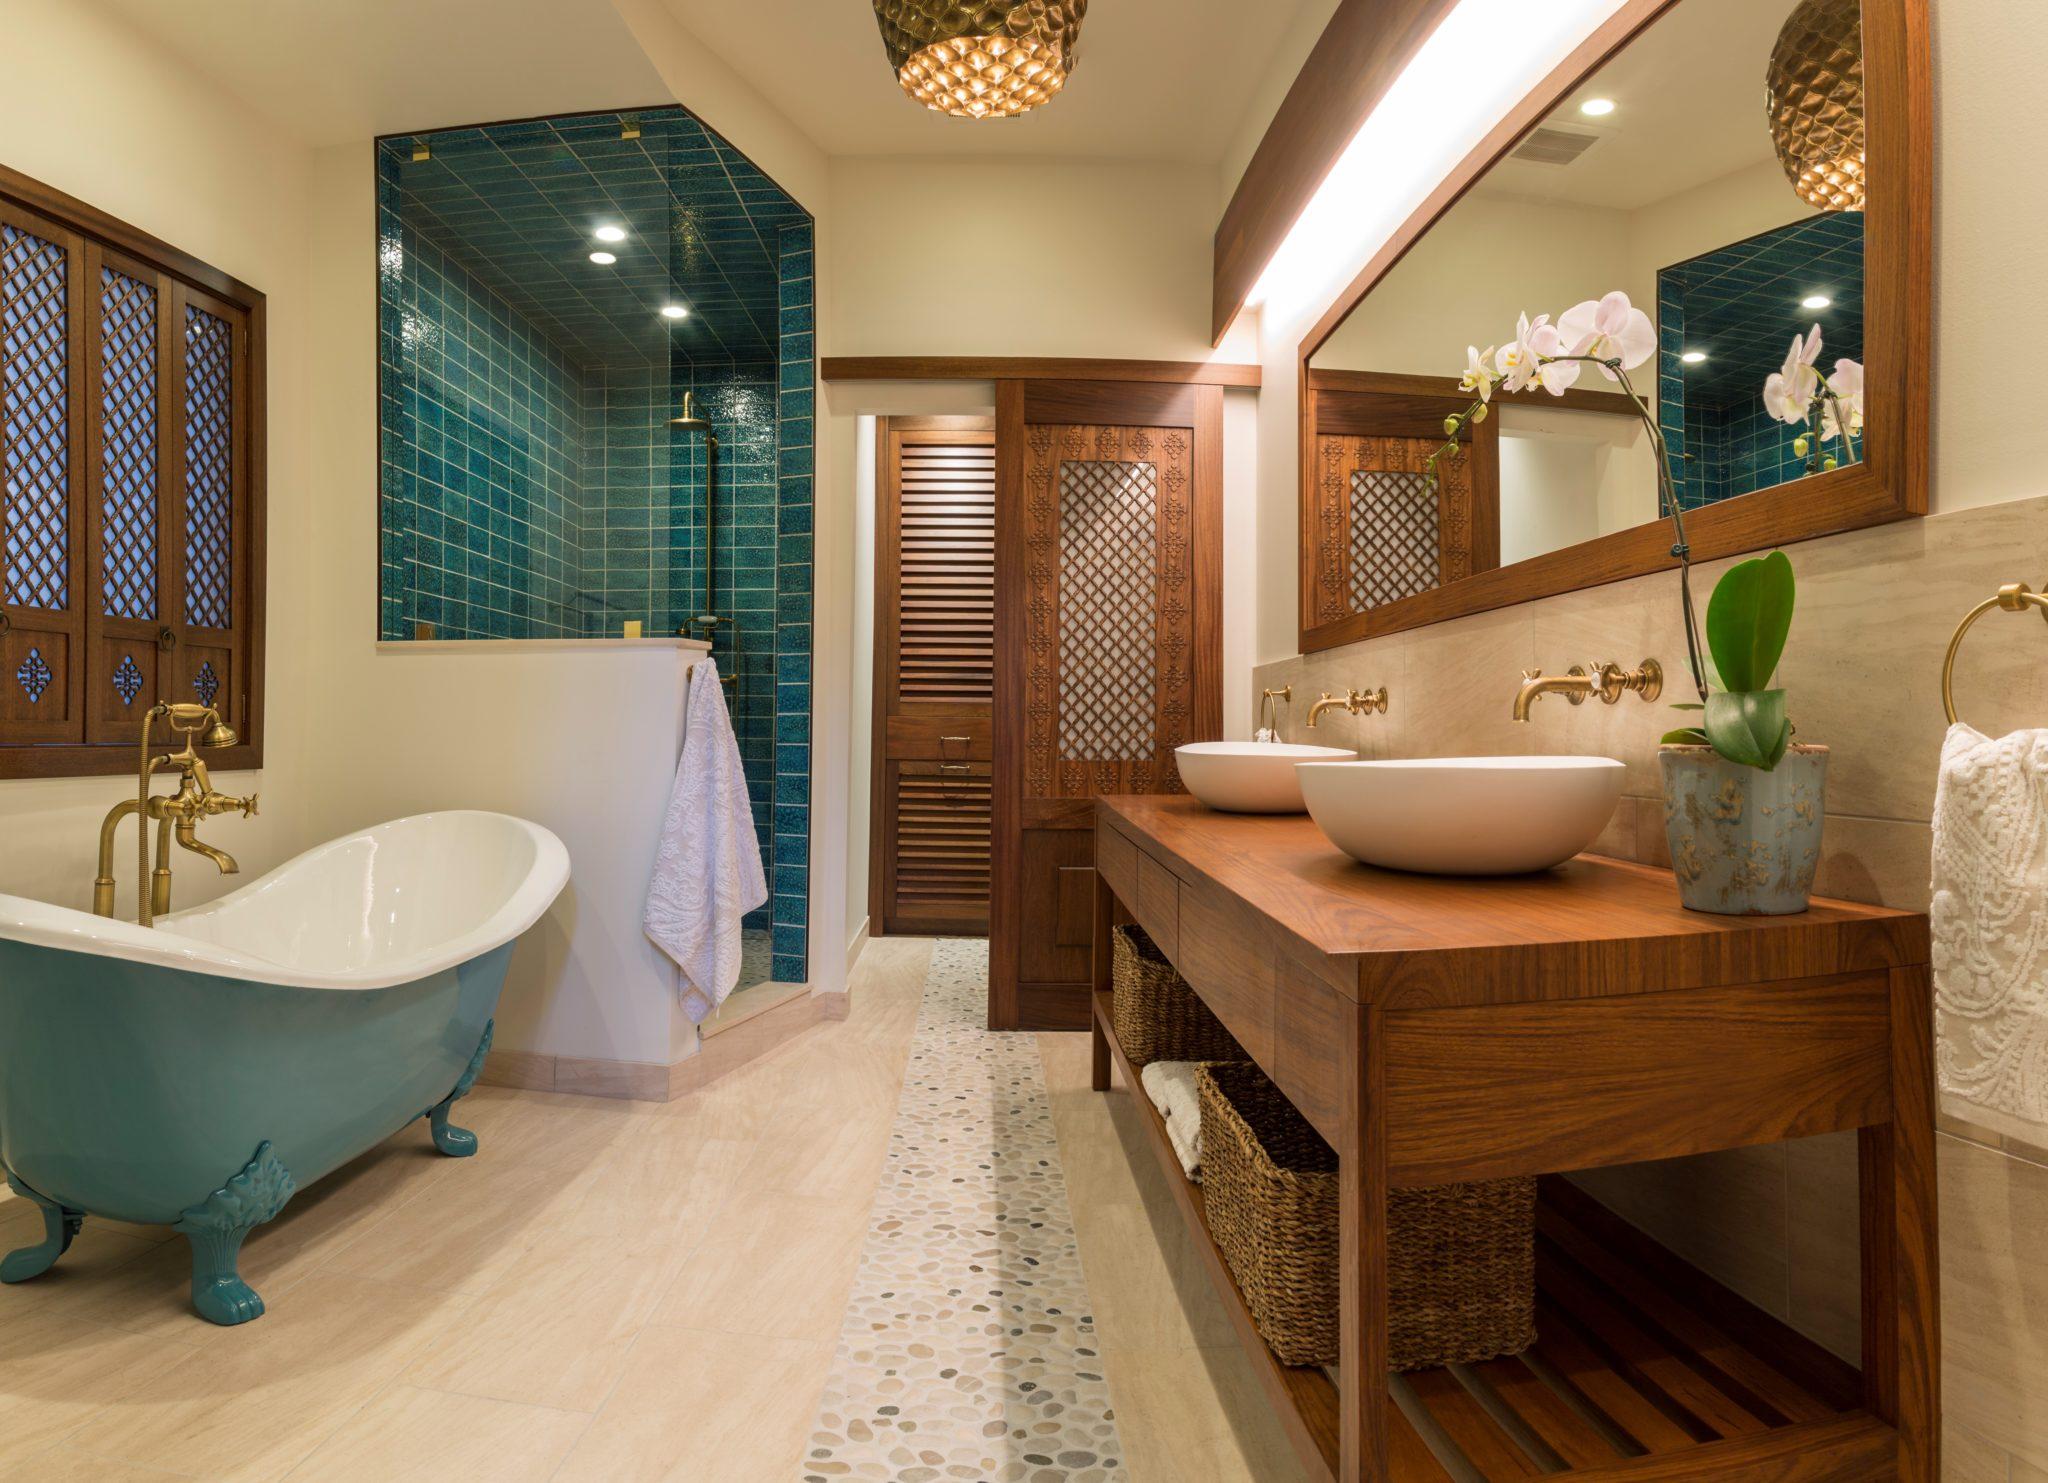 Island Master Bath Tile by Mia Rao Design